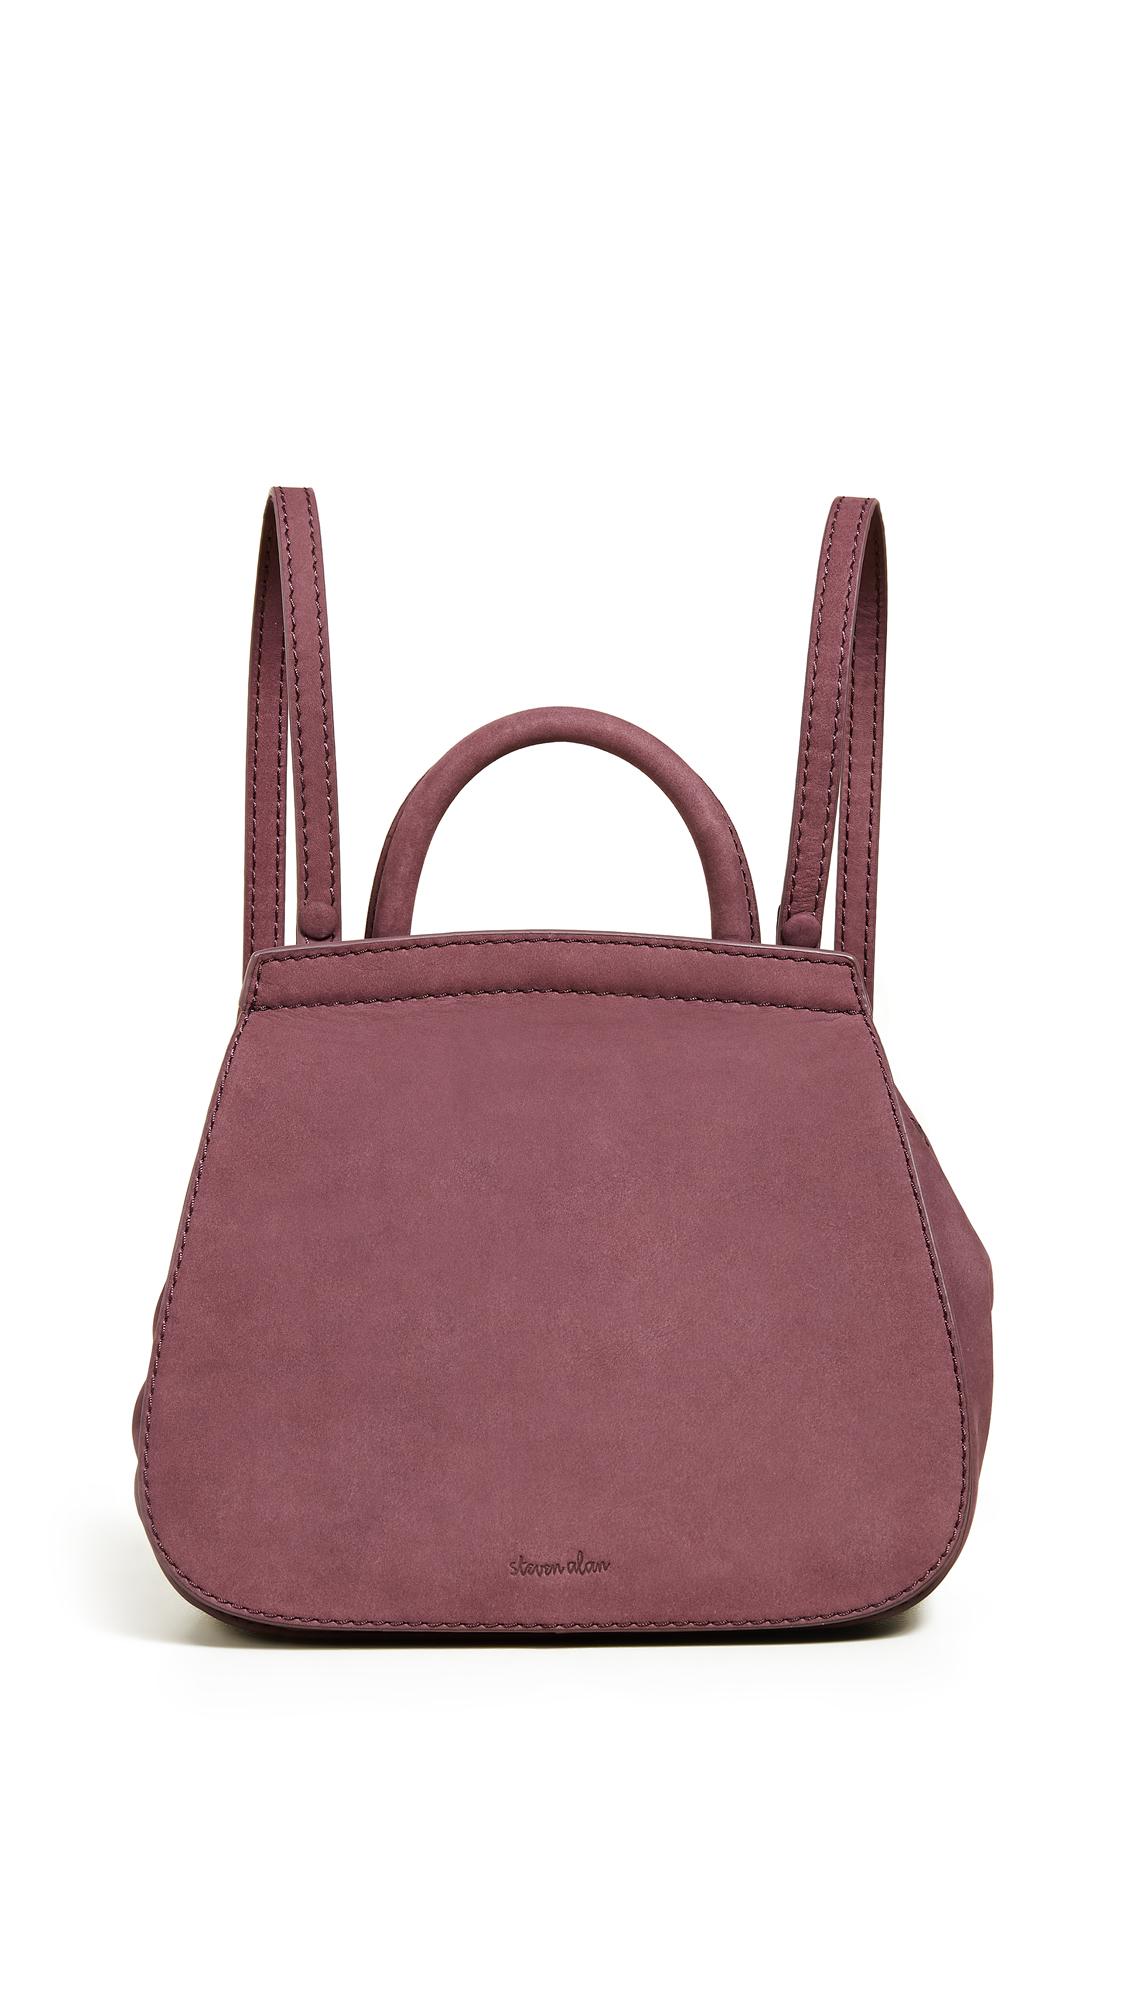 STEVEN ALAN Kate Mini Convertible Backpack in Vineyard Wine